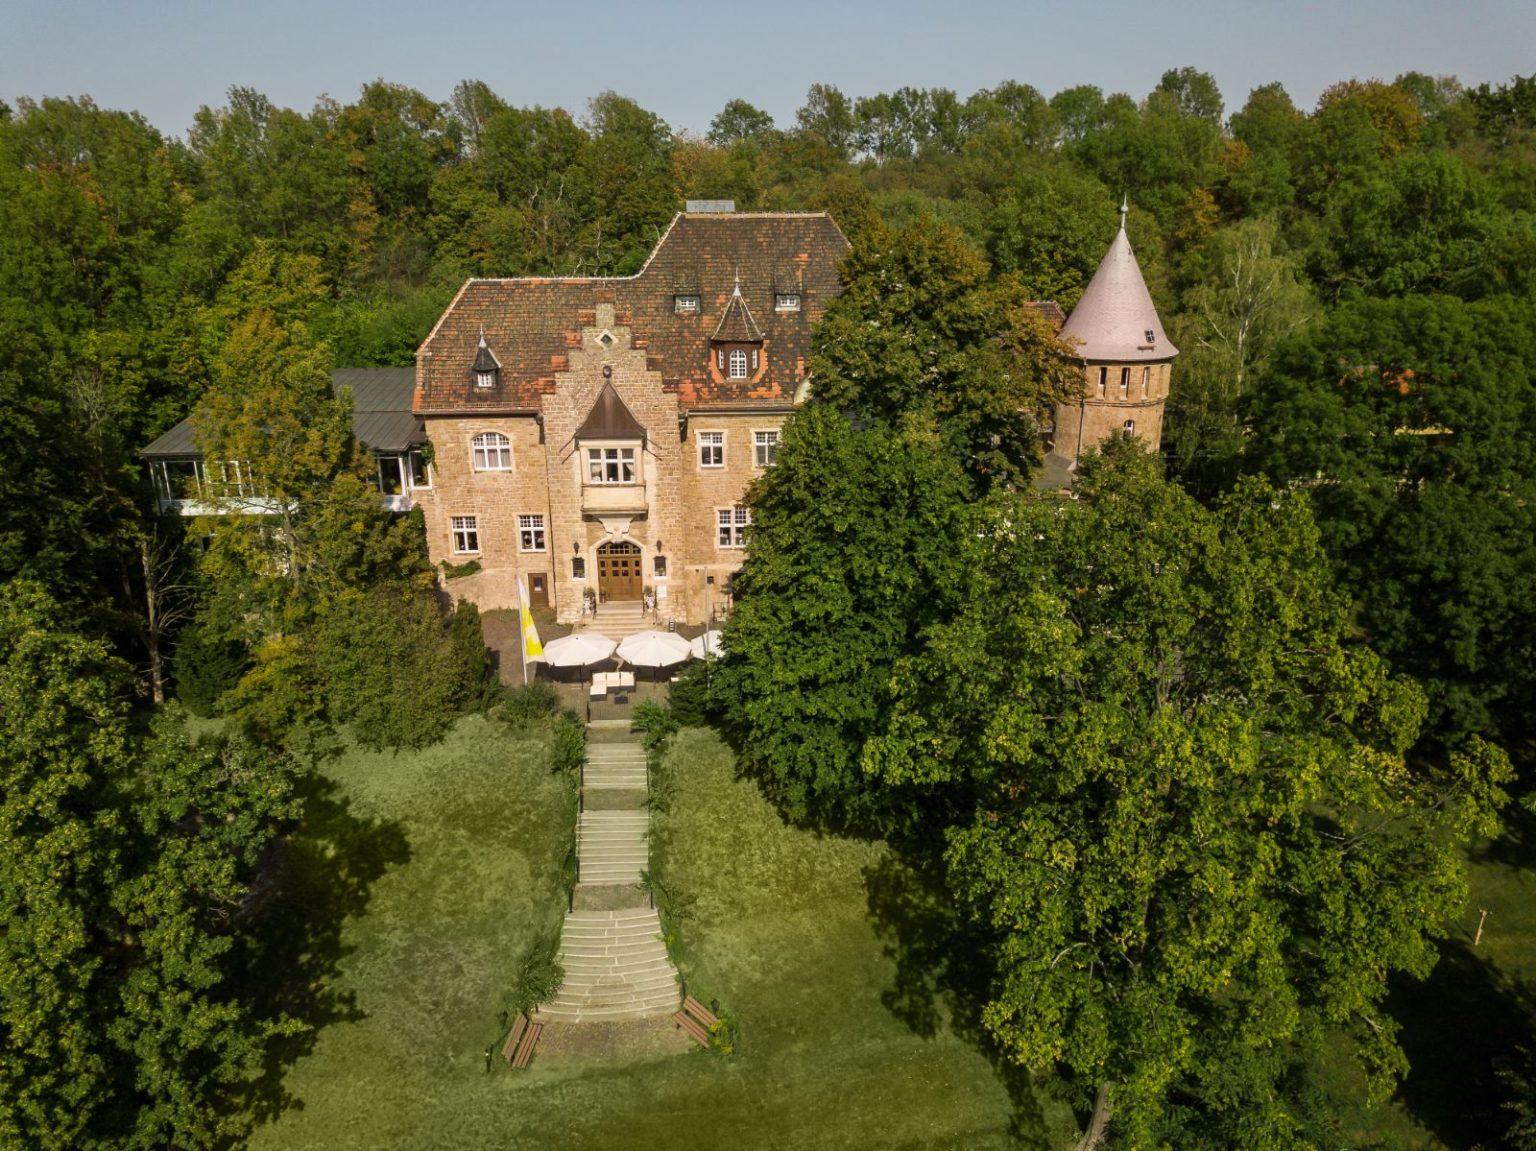 Ringhotel Villa Westerberge